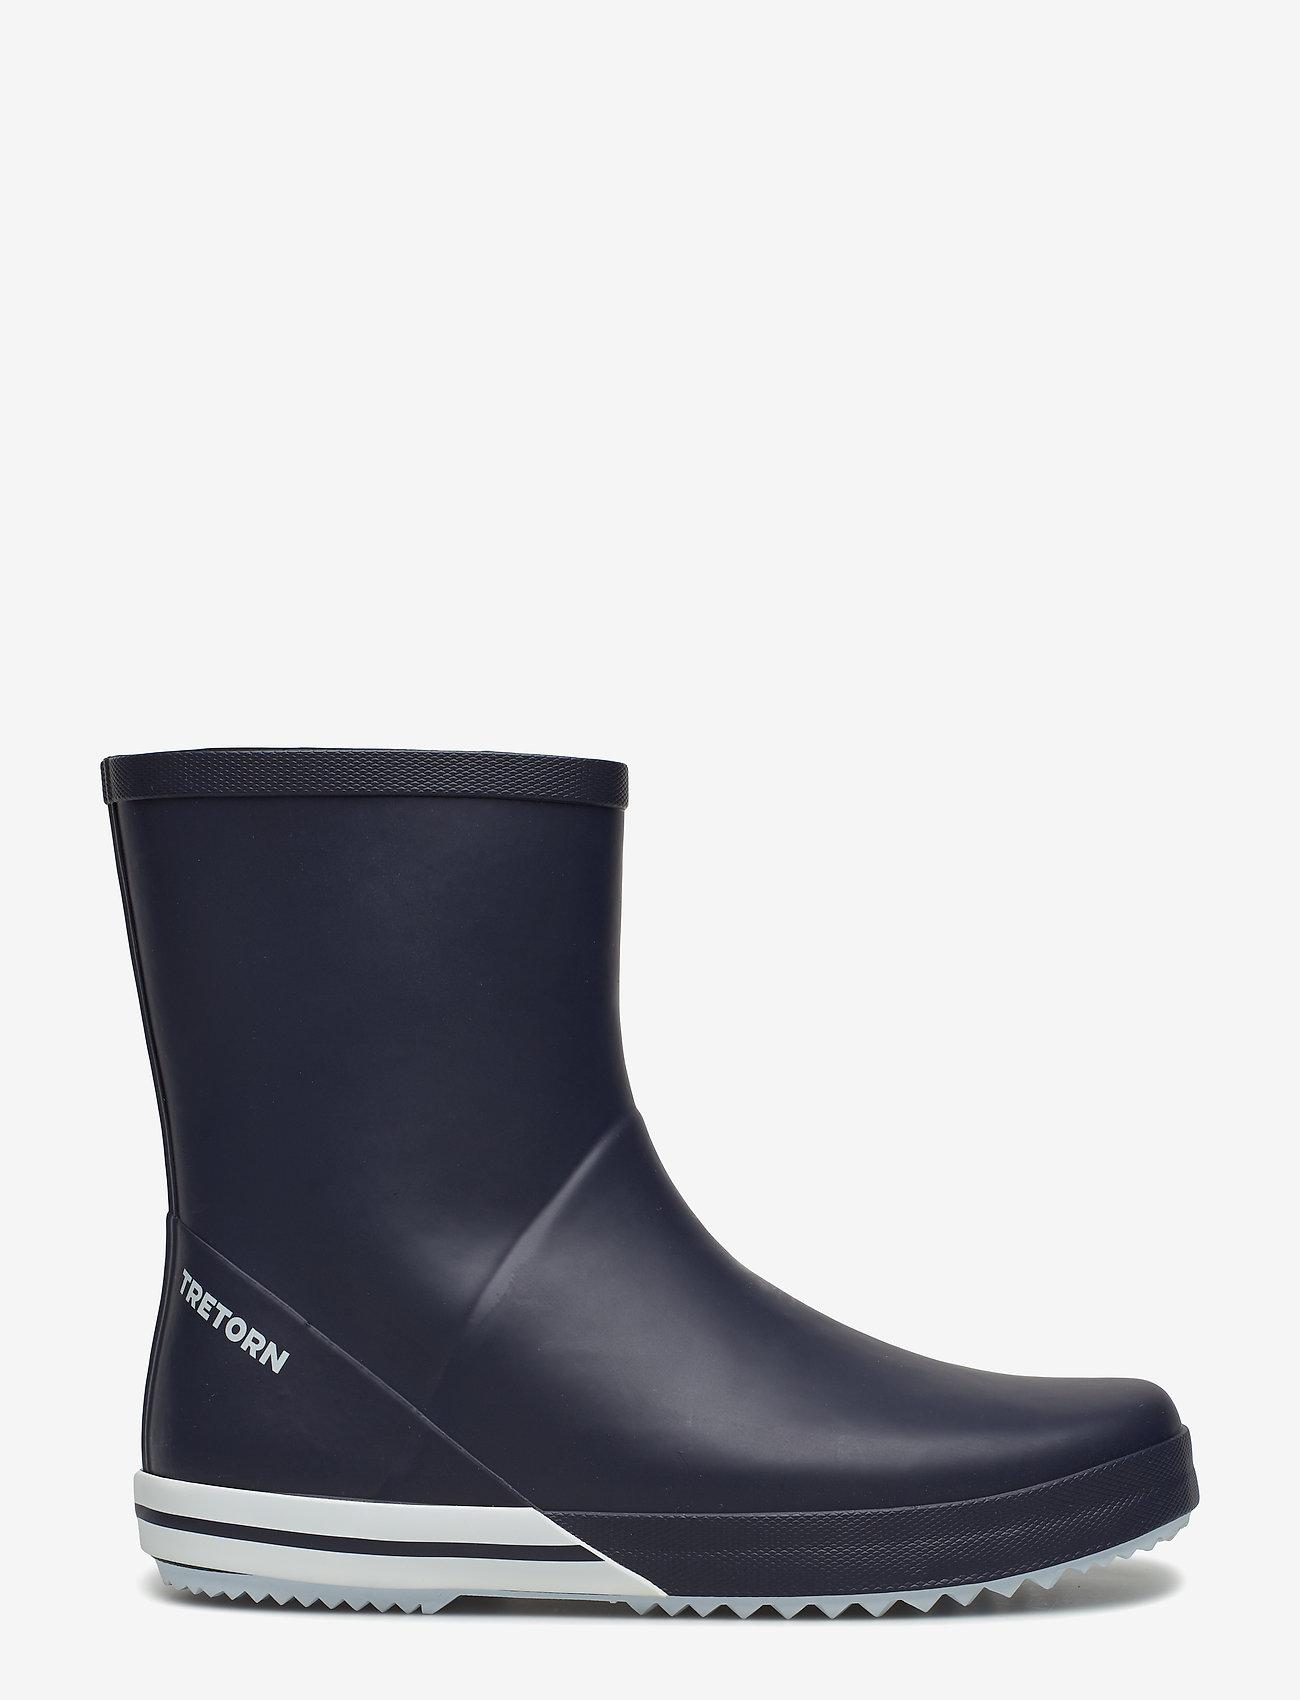 Tretorn - BASIC MID - chaussures - 080/navy - 1